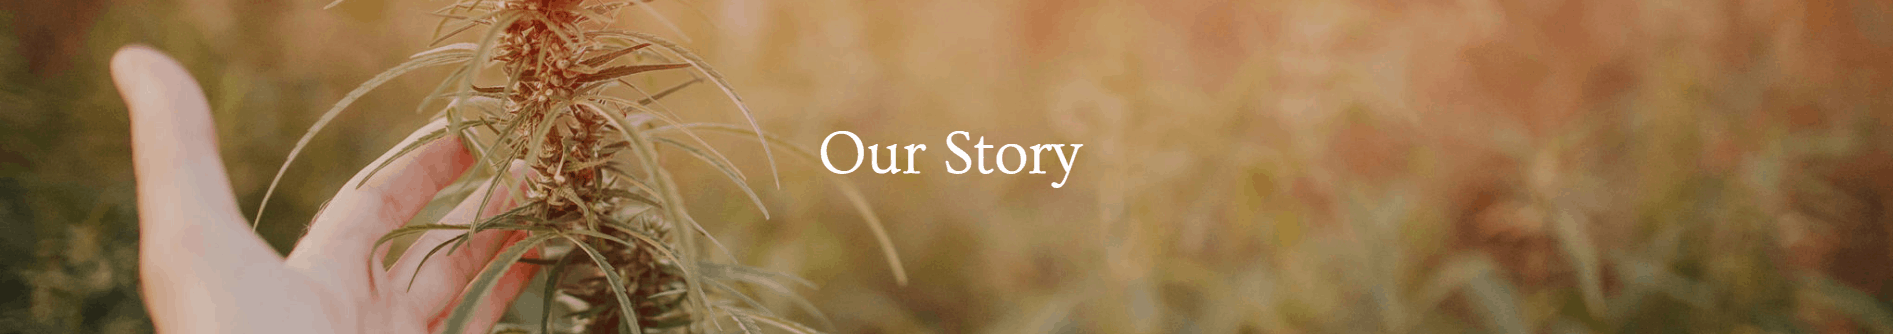 Nira CBD Coupons Our Story